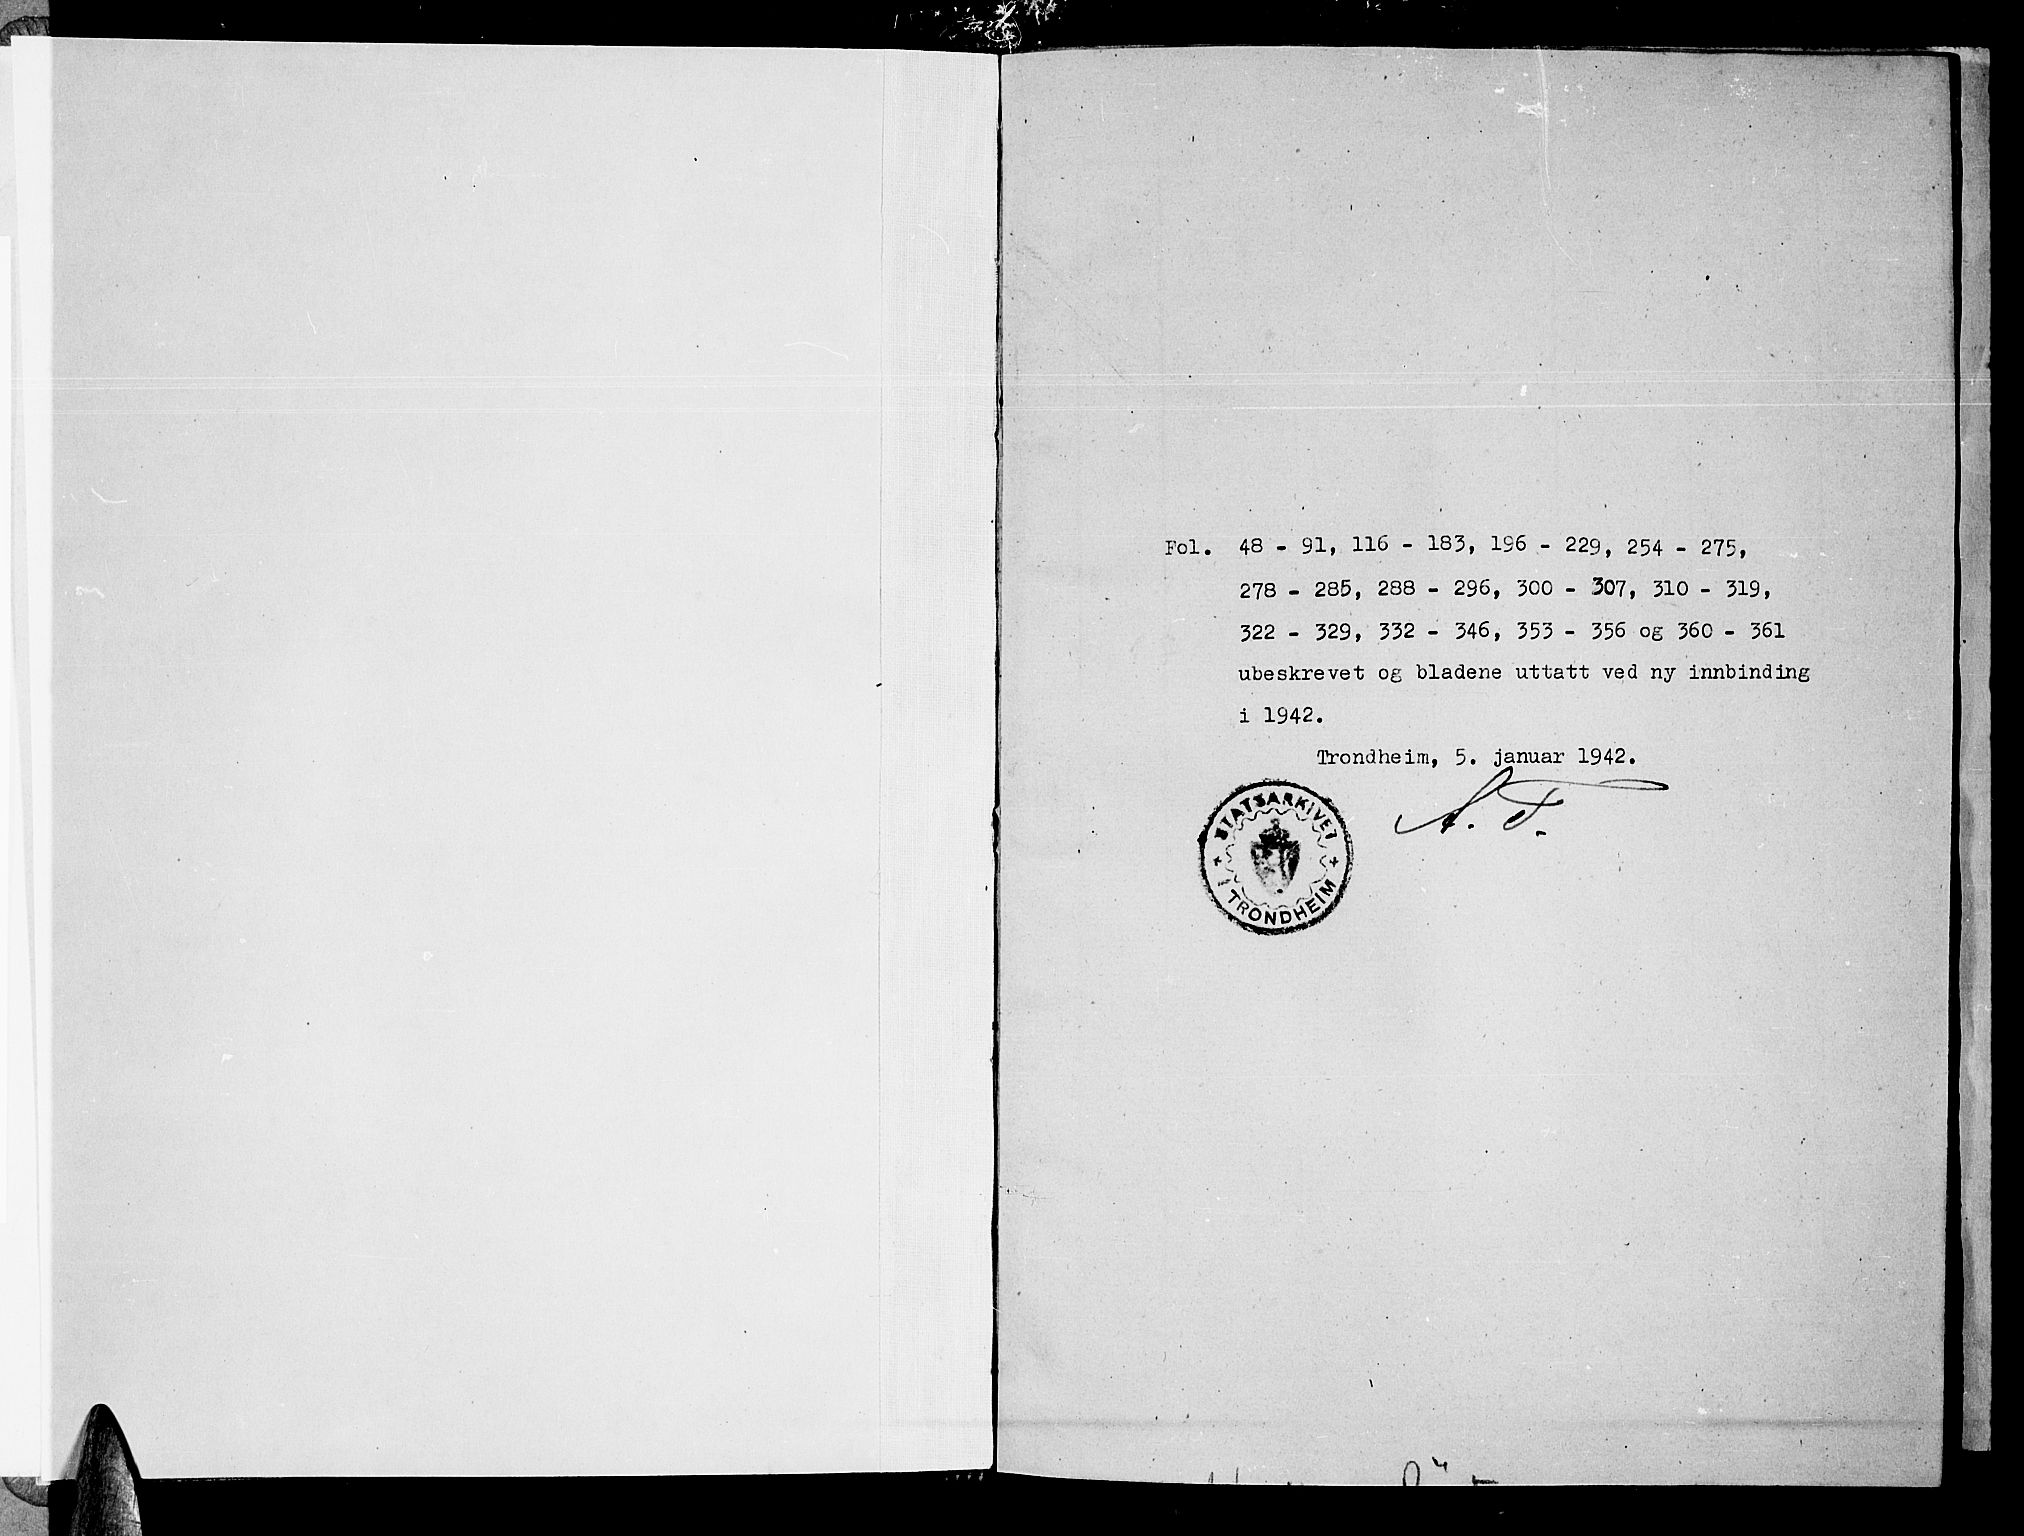 SAT, Ministerialprotokoller, klokkerbøker og fødselsregistre - Nordland, 807/L0120: Ministerialbok nr. 807A03, 1821-1848